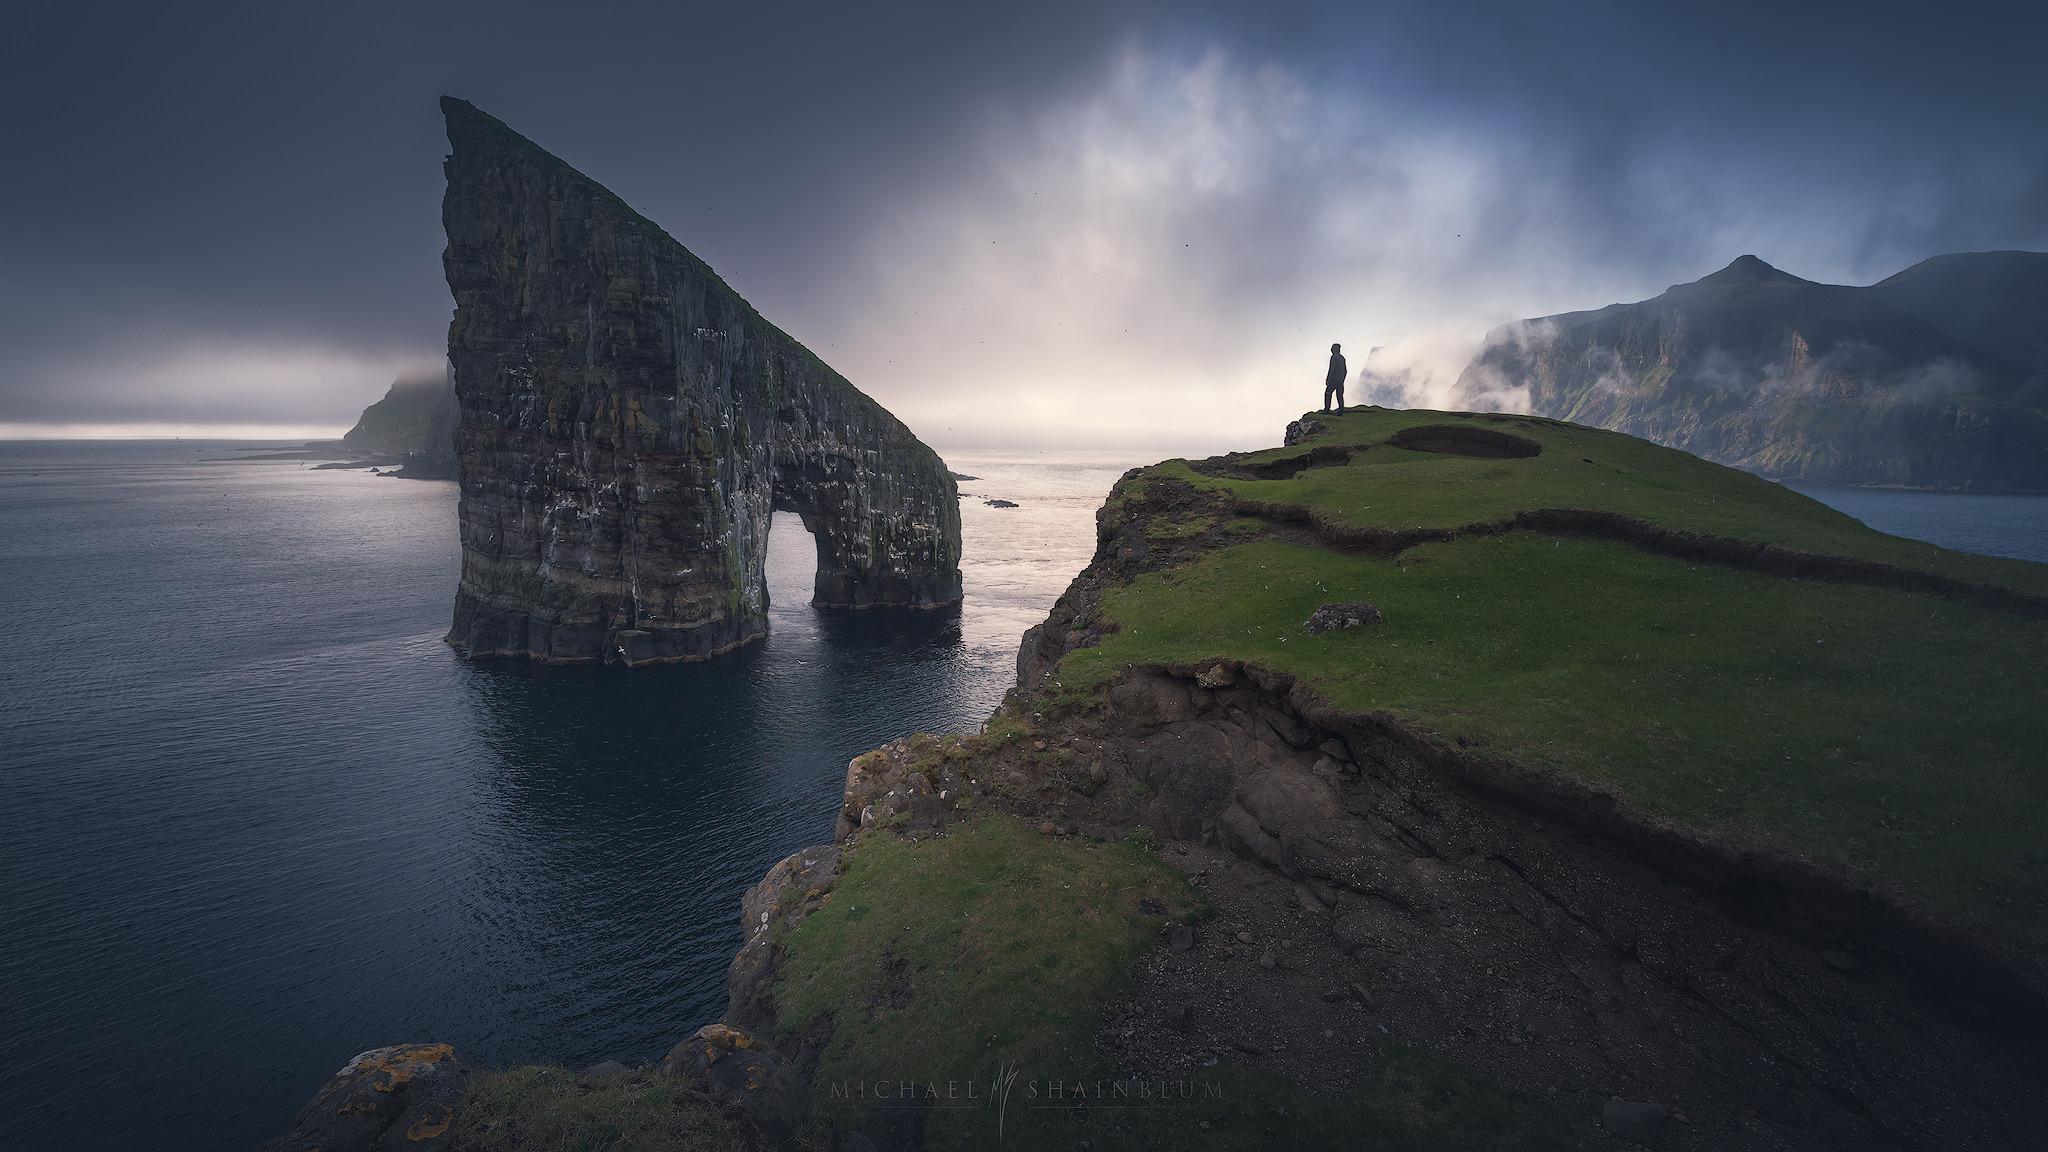 Faroe Islands Landscape Photography